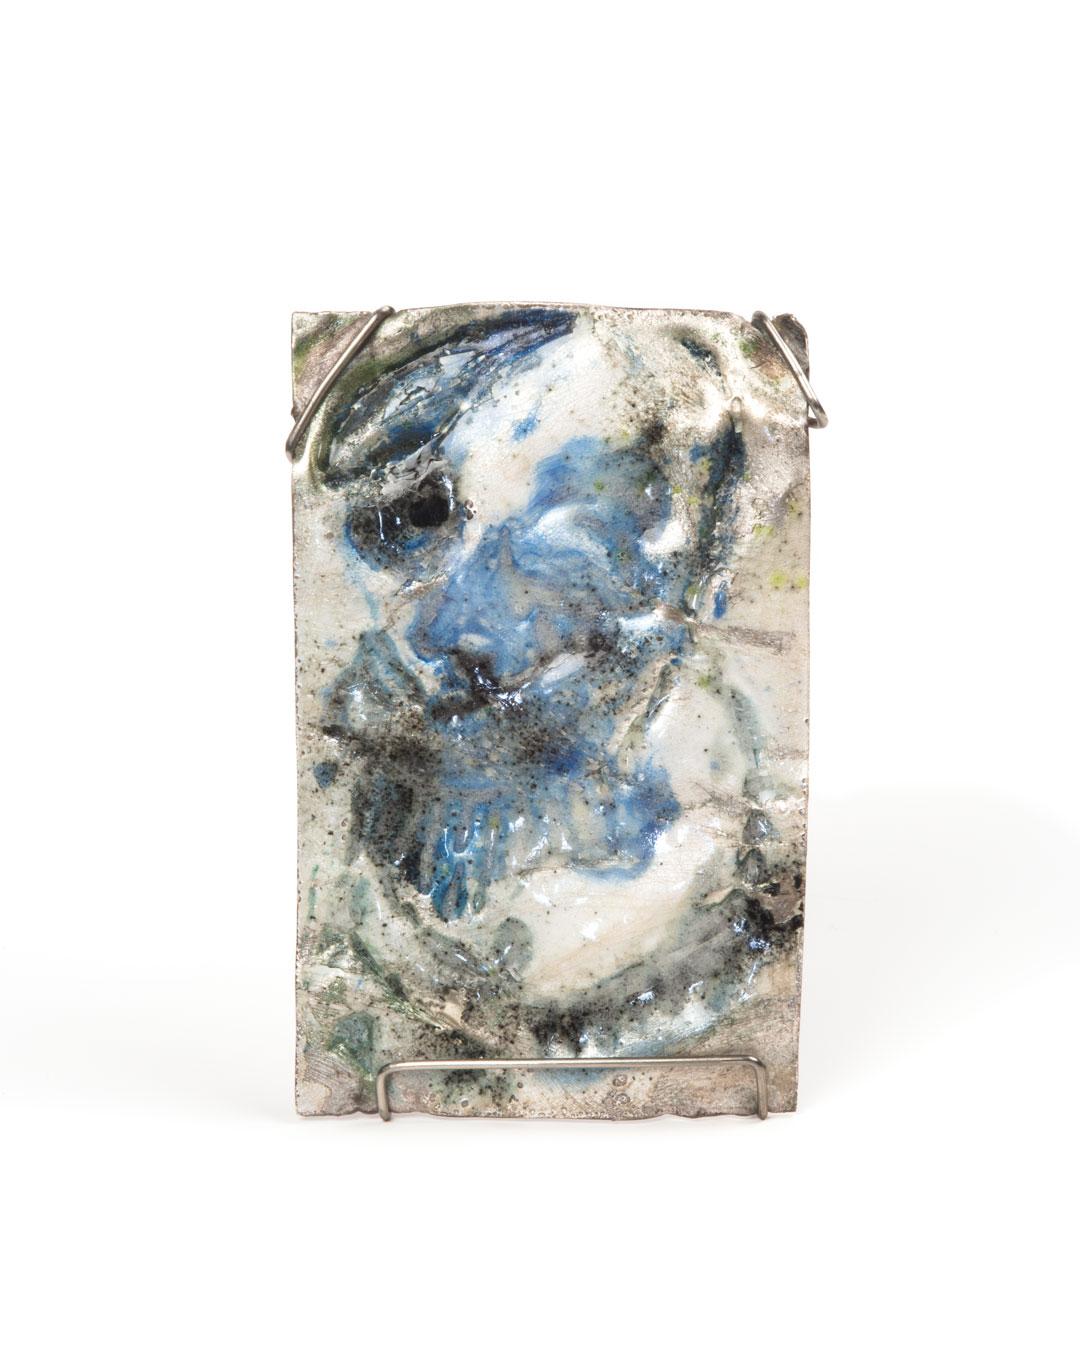 Rudolf Kocéa, Aristo, 2019, brooch; fine silver, enamel, stainless steel, 60 x 92 x 10 mm, €1500